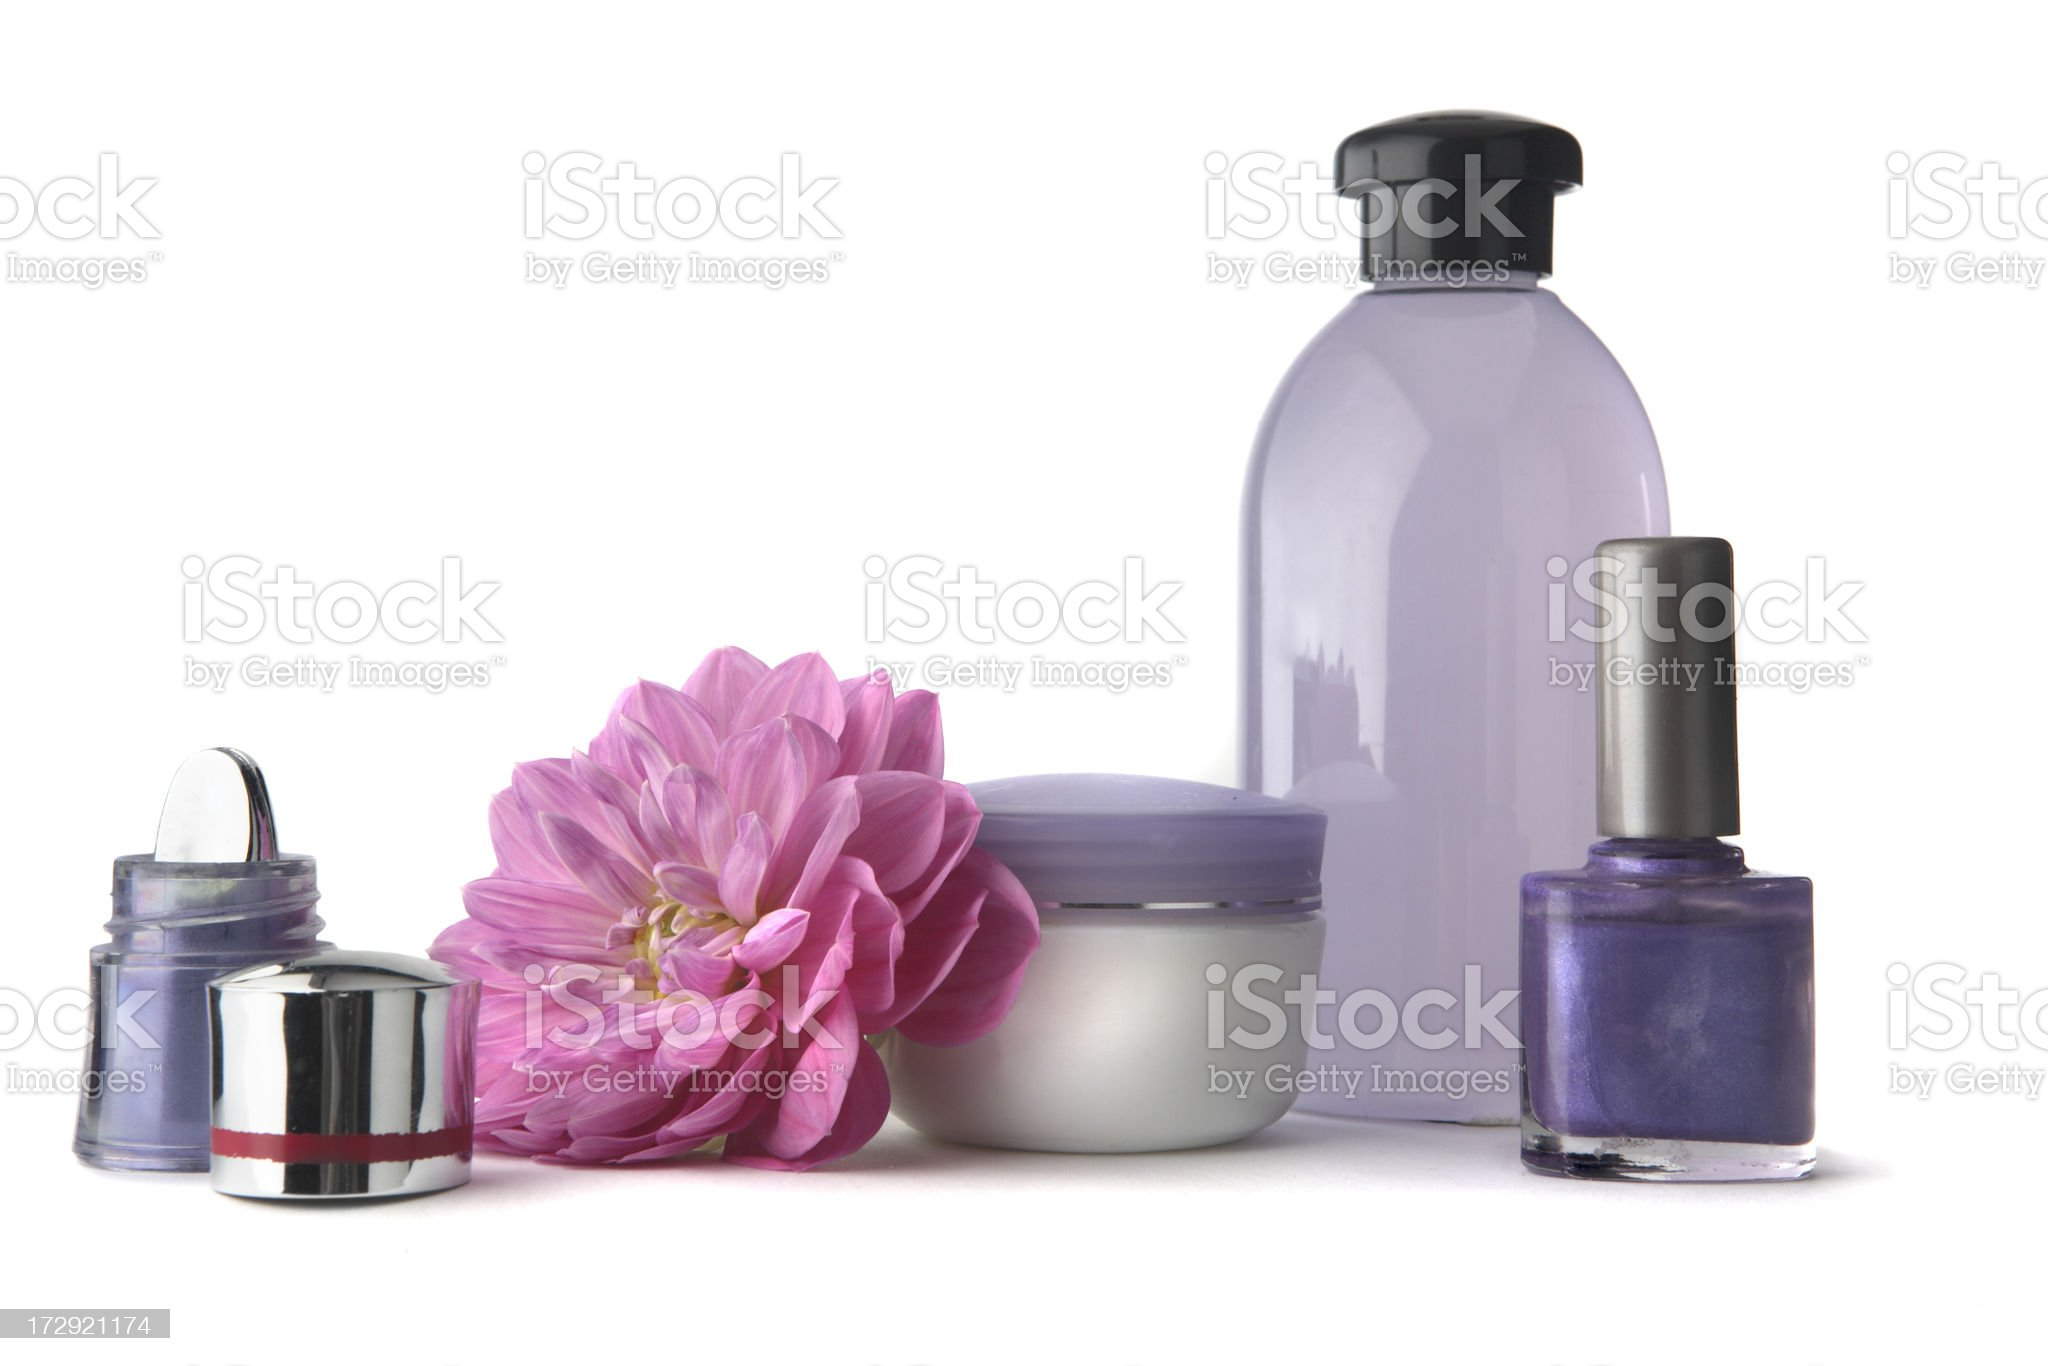 Cosmetics: Eyeshadow, Nail Polish, Soap, Moisturizer and Flower royalty-free stock photo